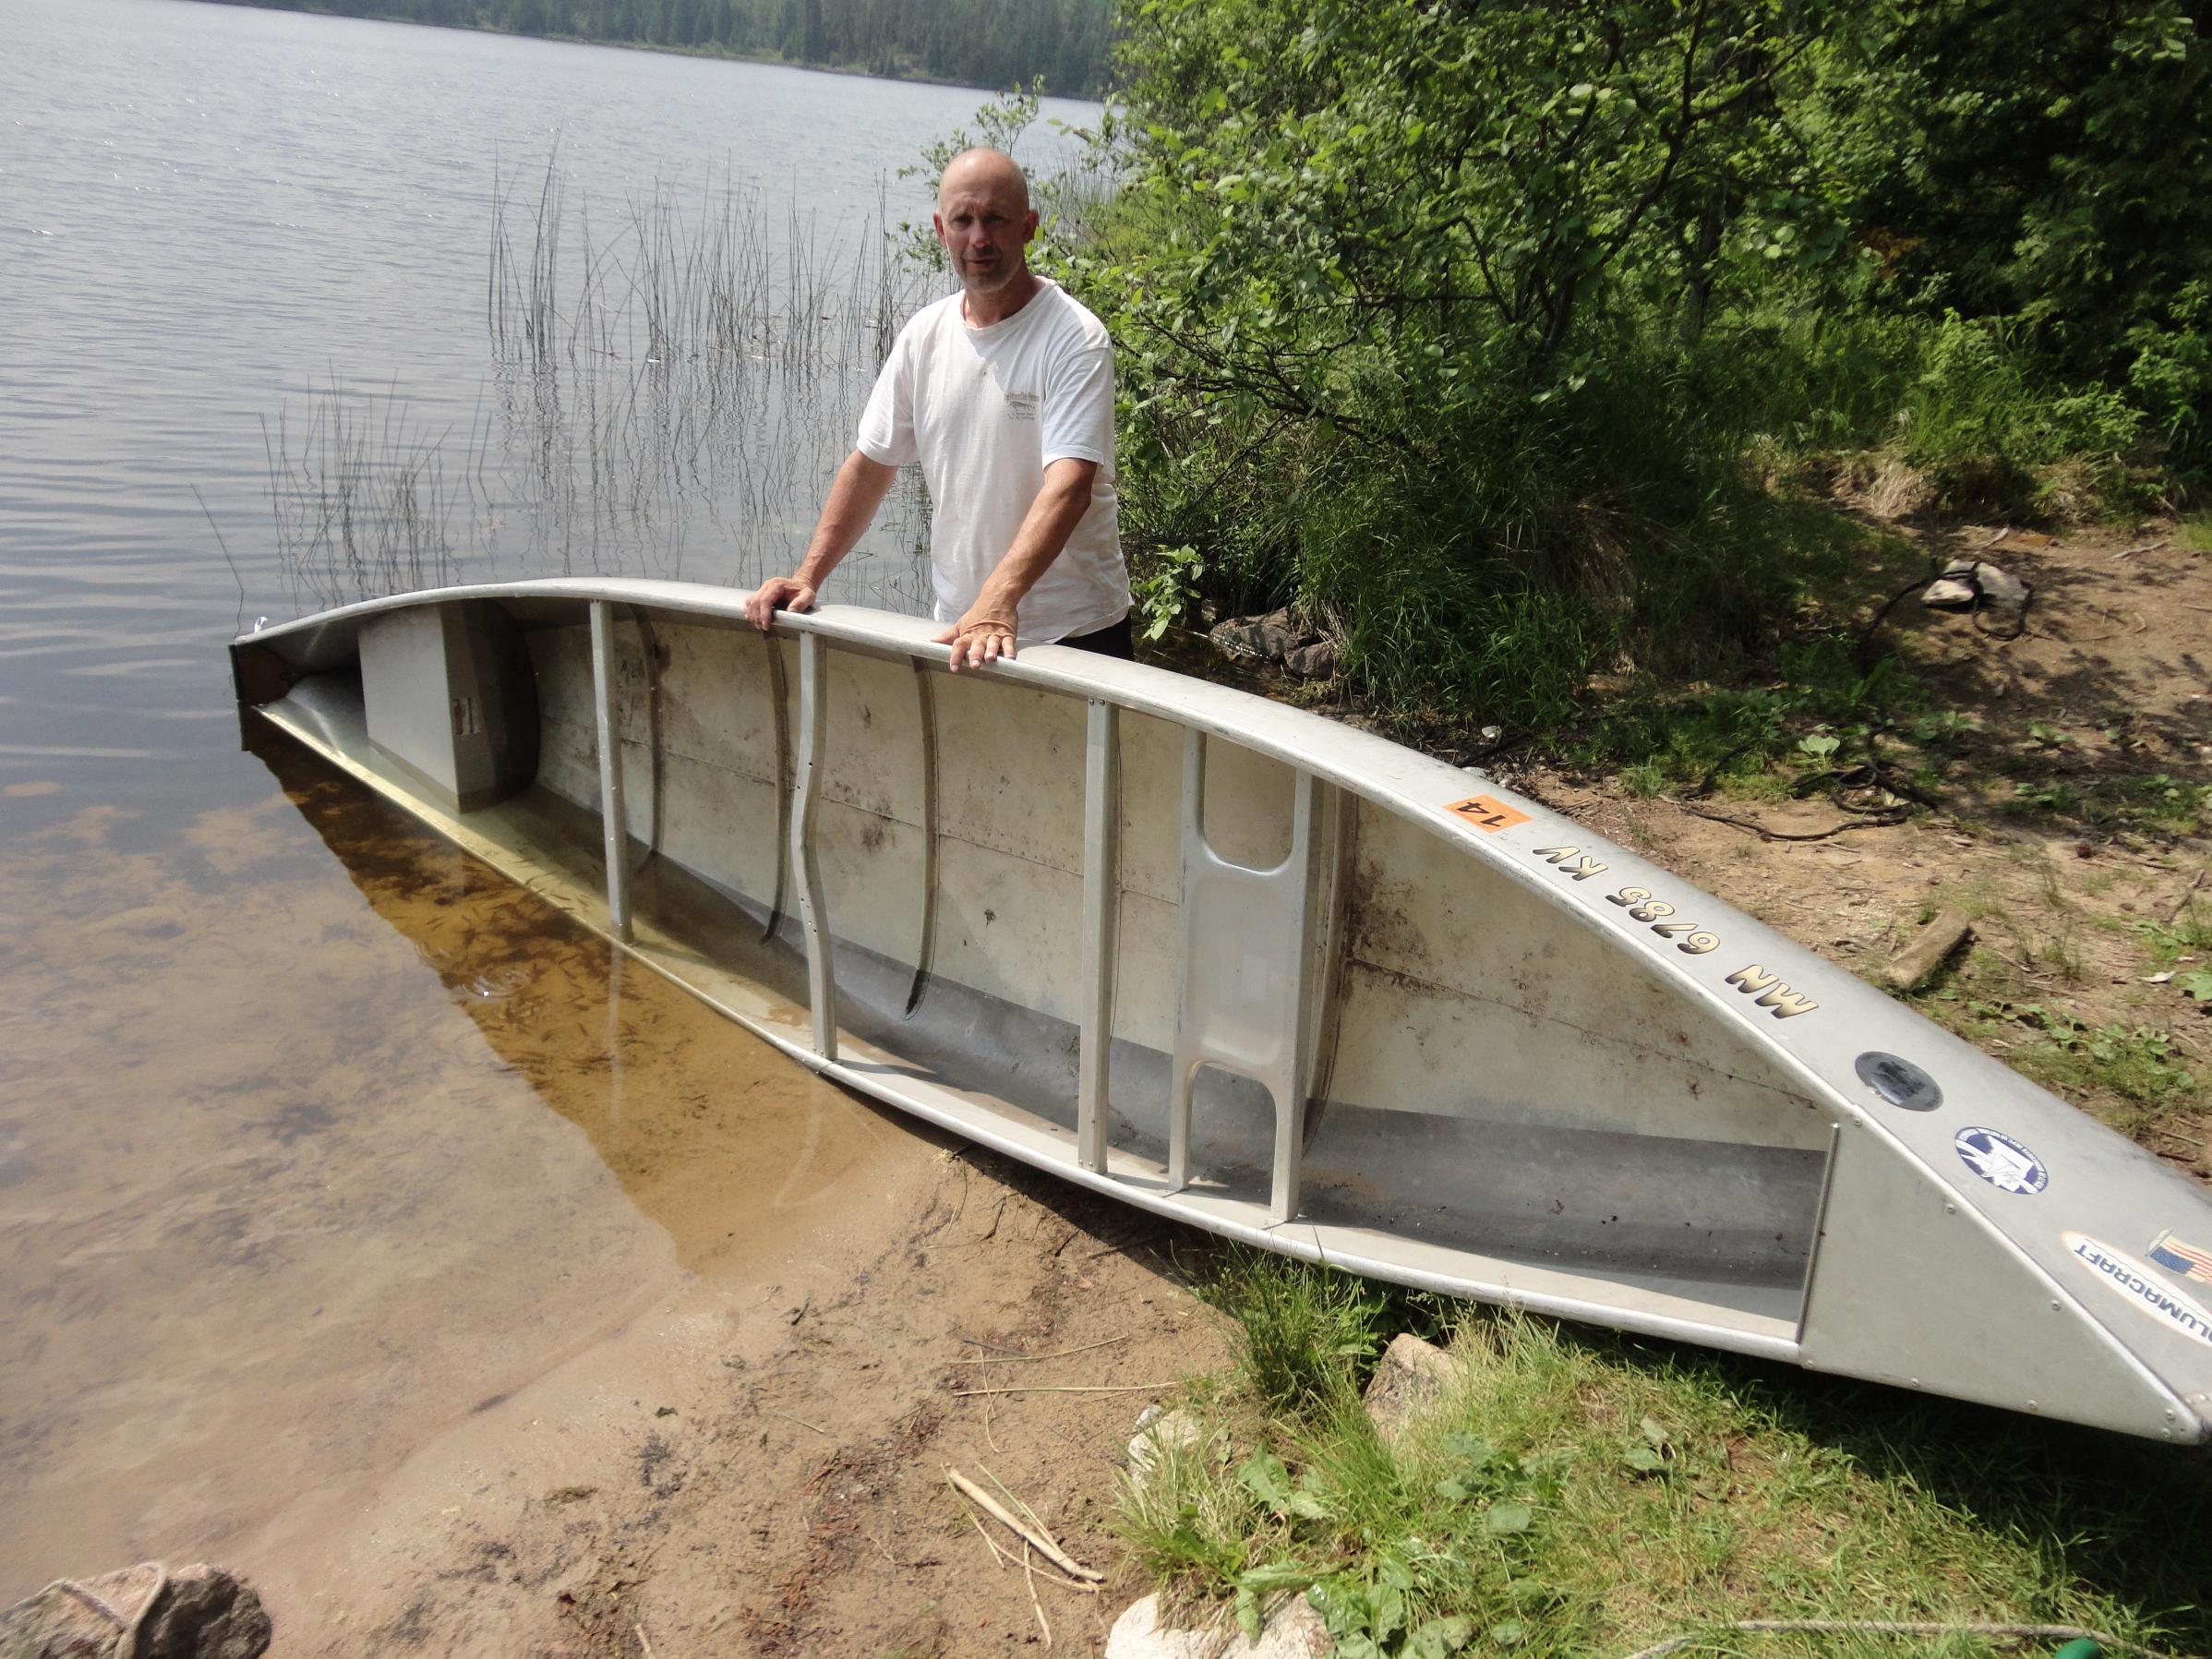 BWCA Square stern vs regular keeled canoes paddling ease